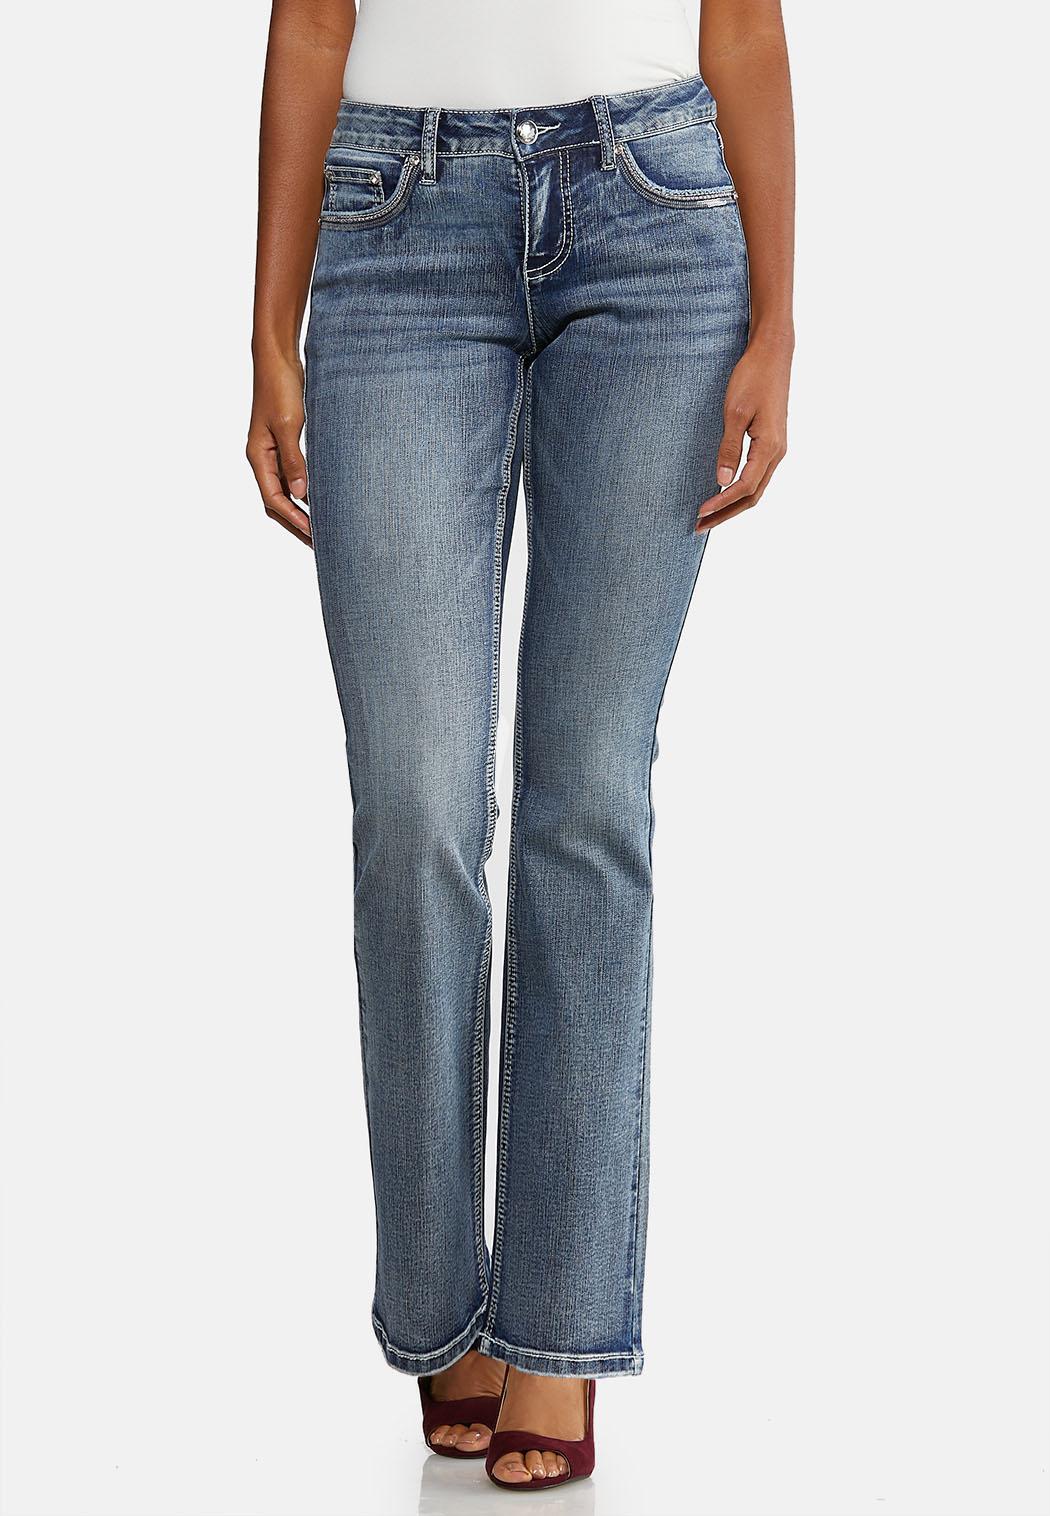 Petite Chevron Bling Bootcut Jeans (Item #43991506)